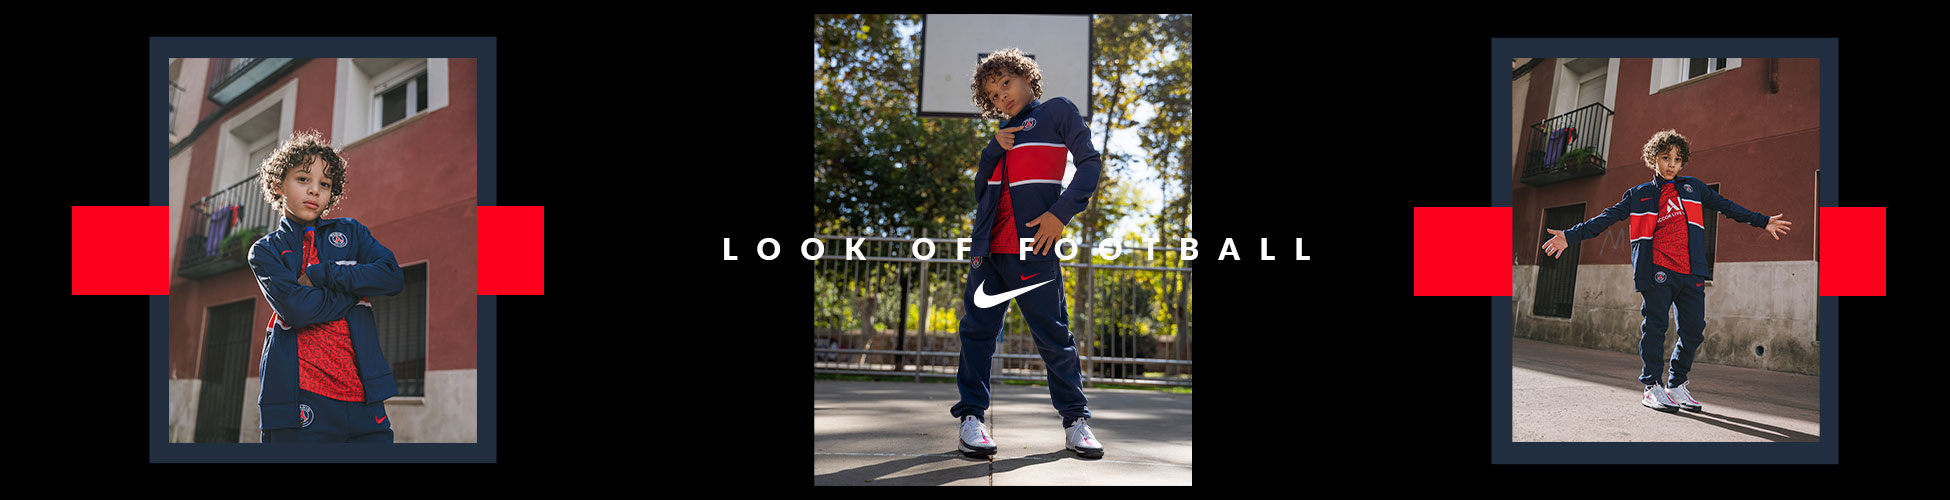 NIKE LOOK OF FOOTBAL NOVIEMBRE 2020 FR